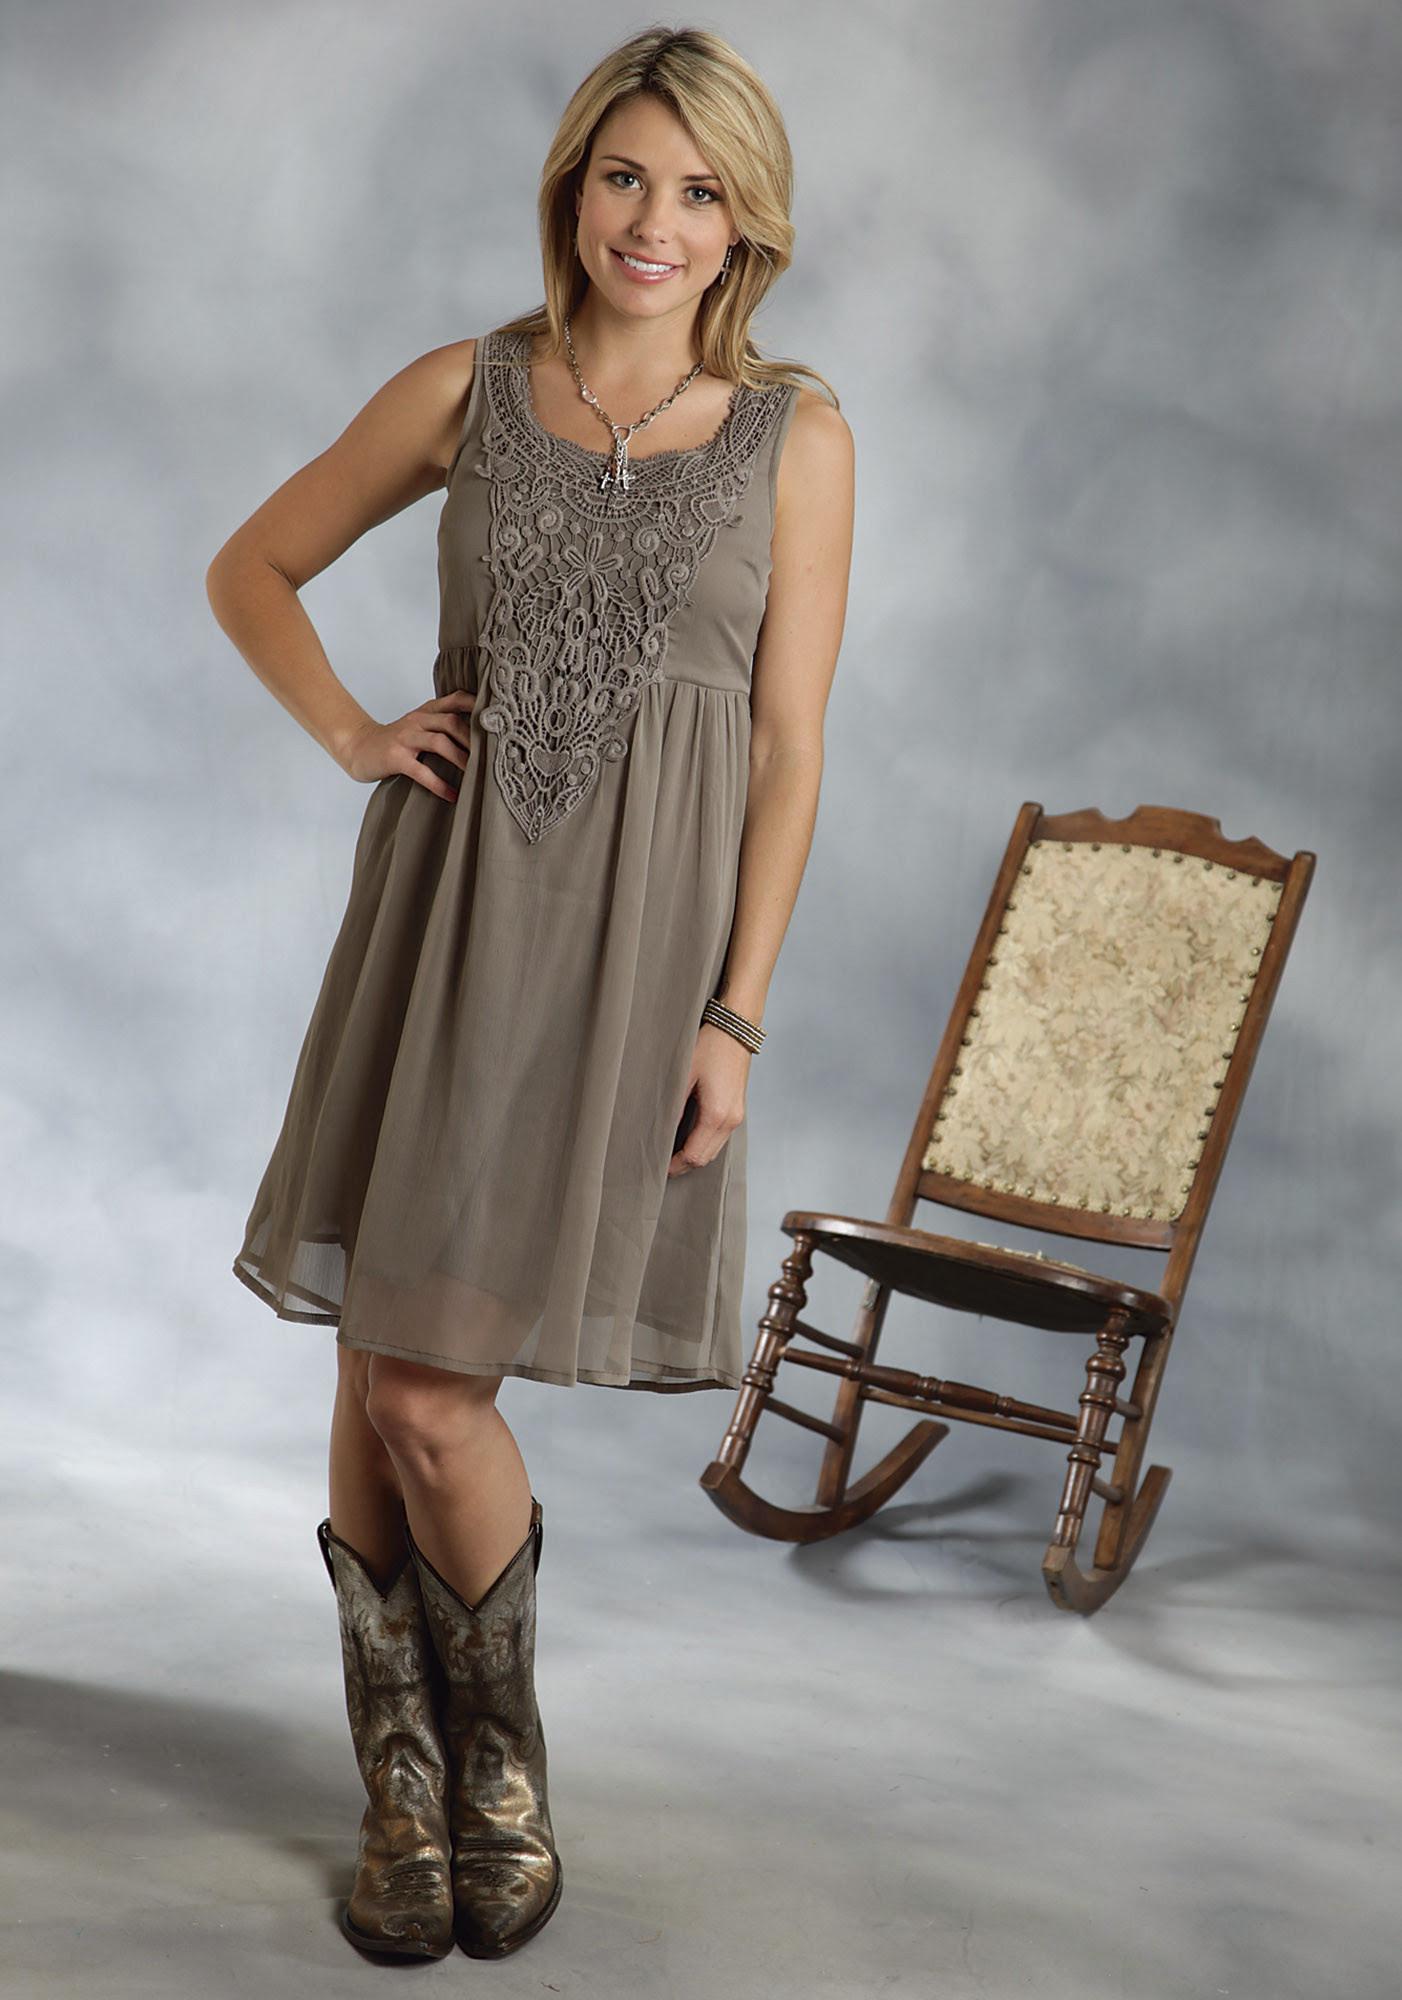 roper® olive chiffon lace empire waist sleeveless western